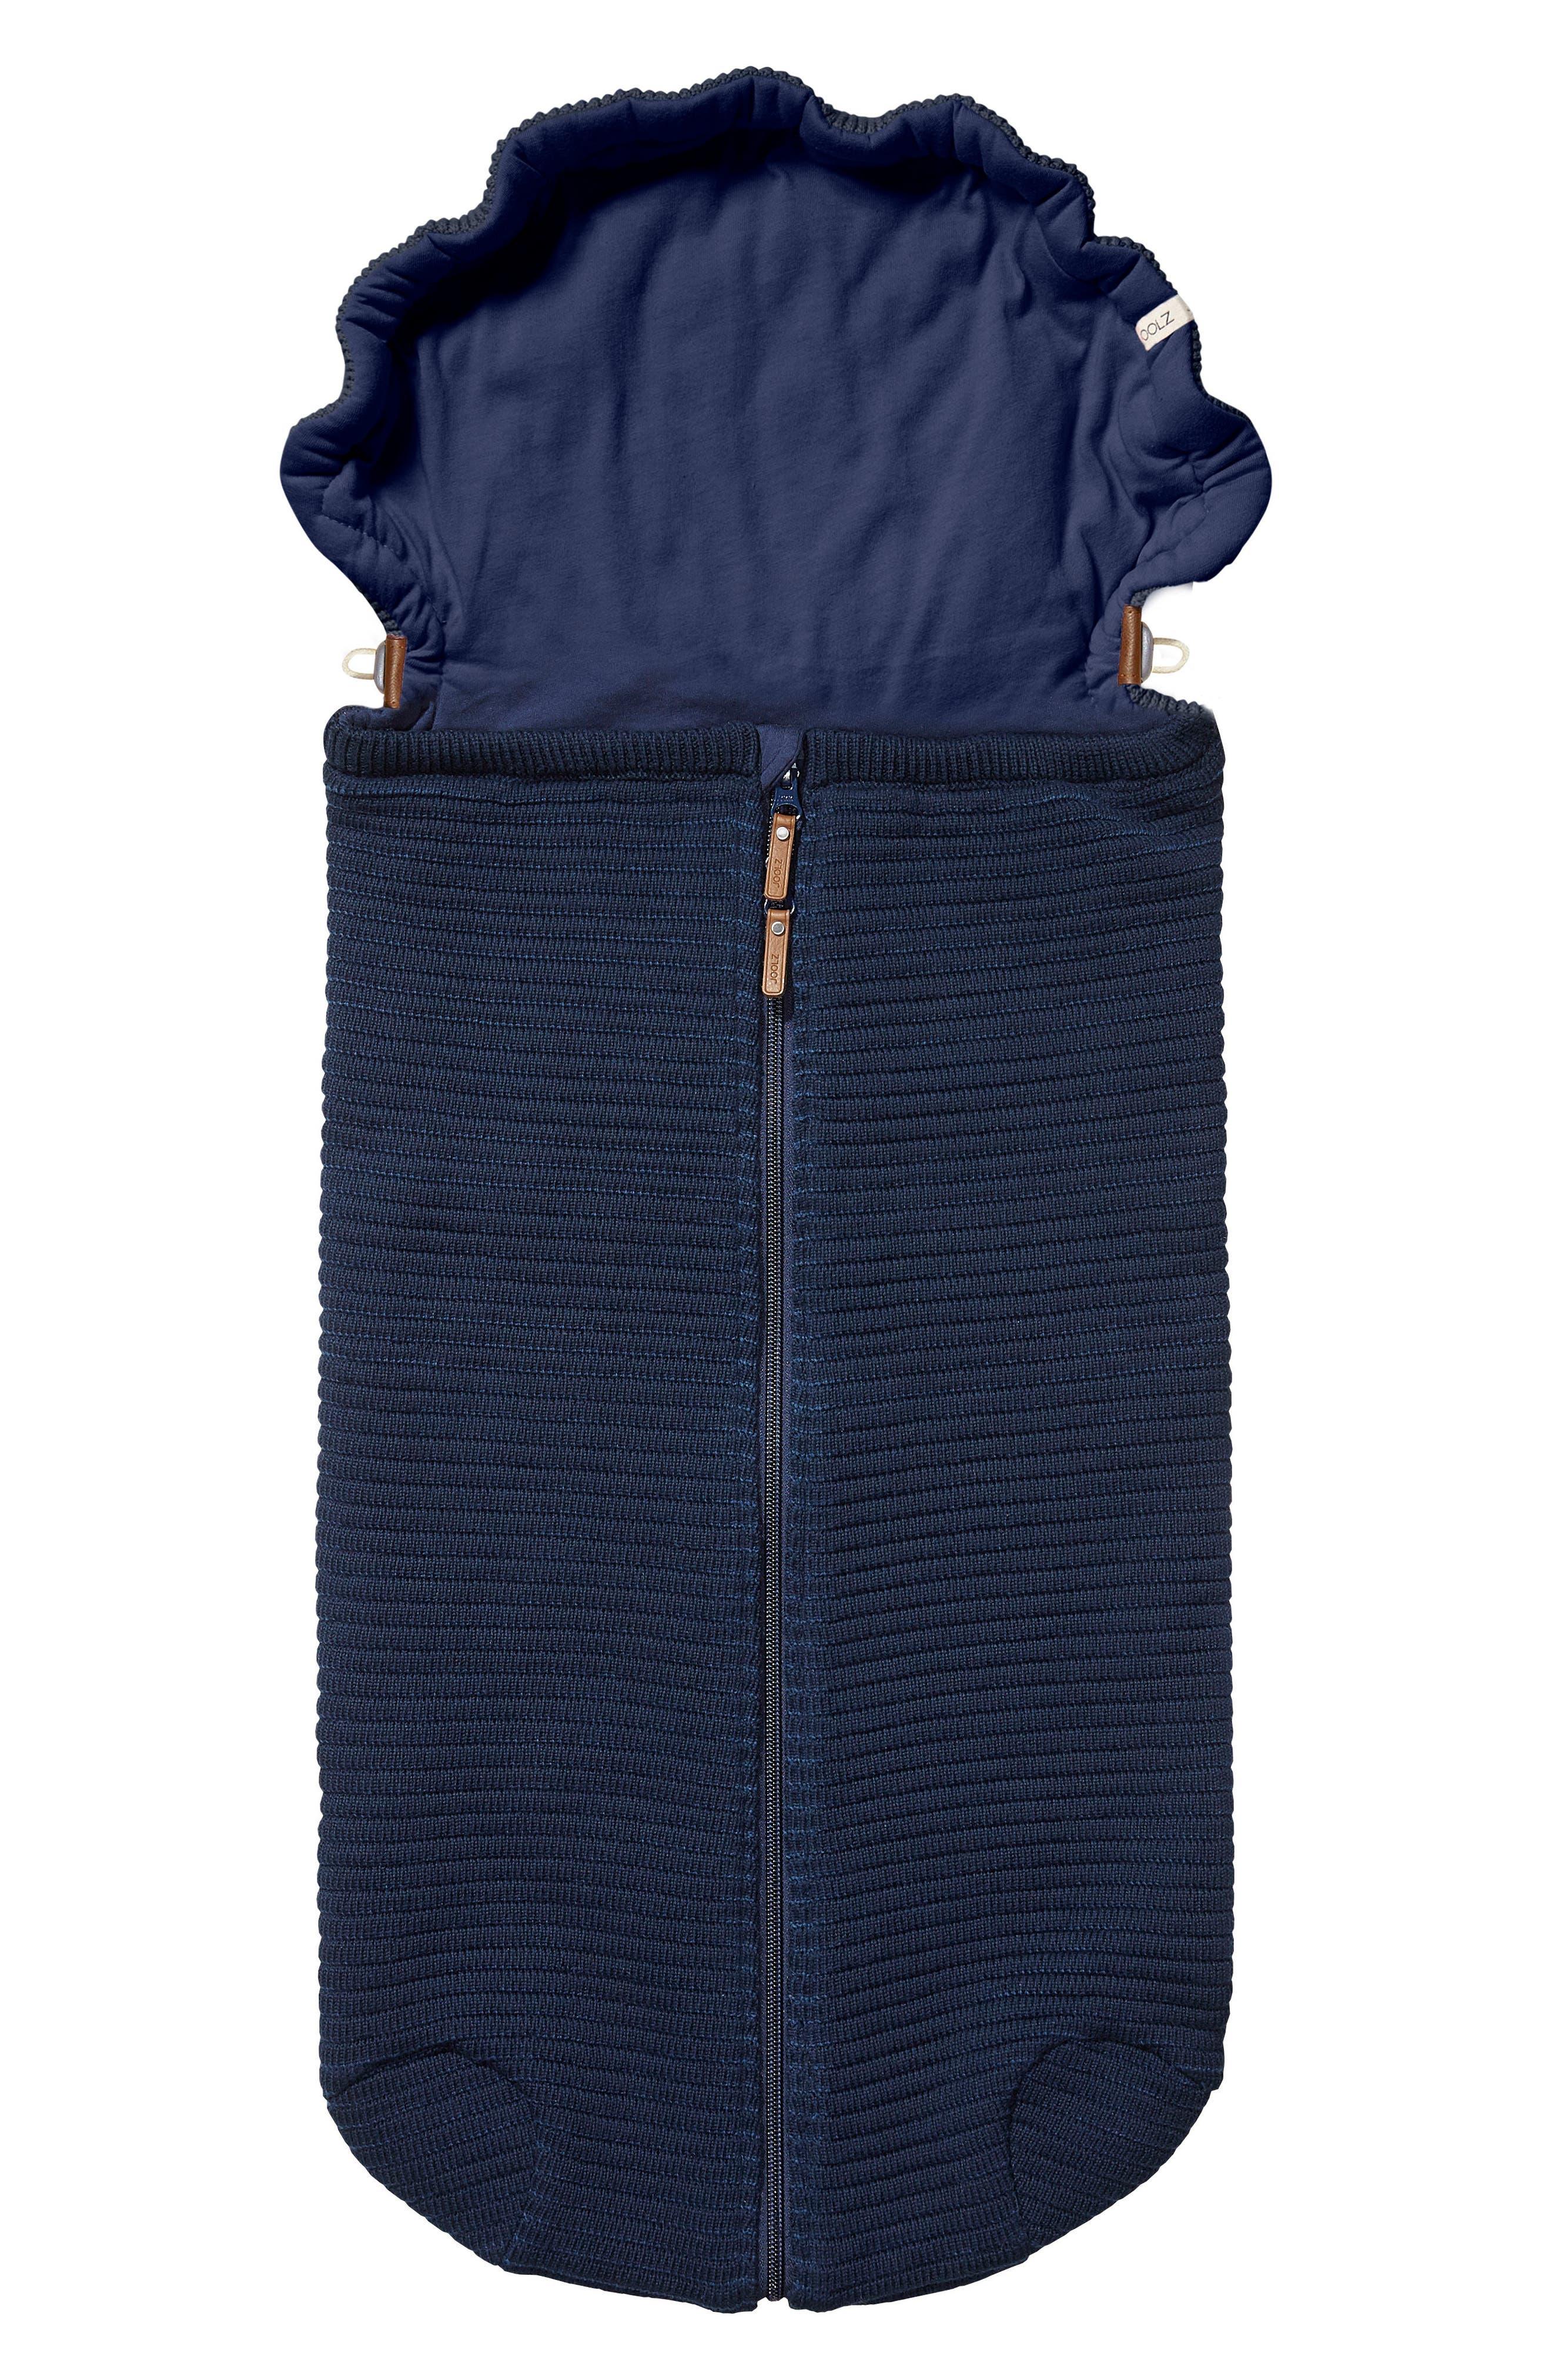 Essentials Ribbed Organic Cotton Nest,                         Main,                         color, Blue